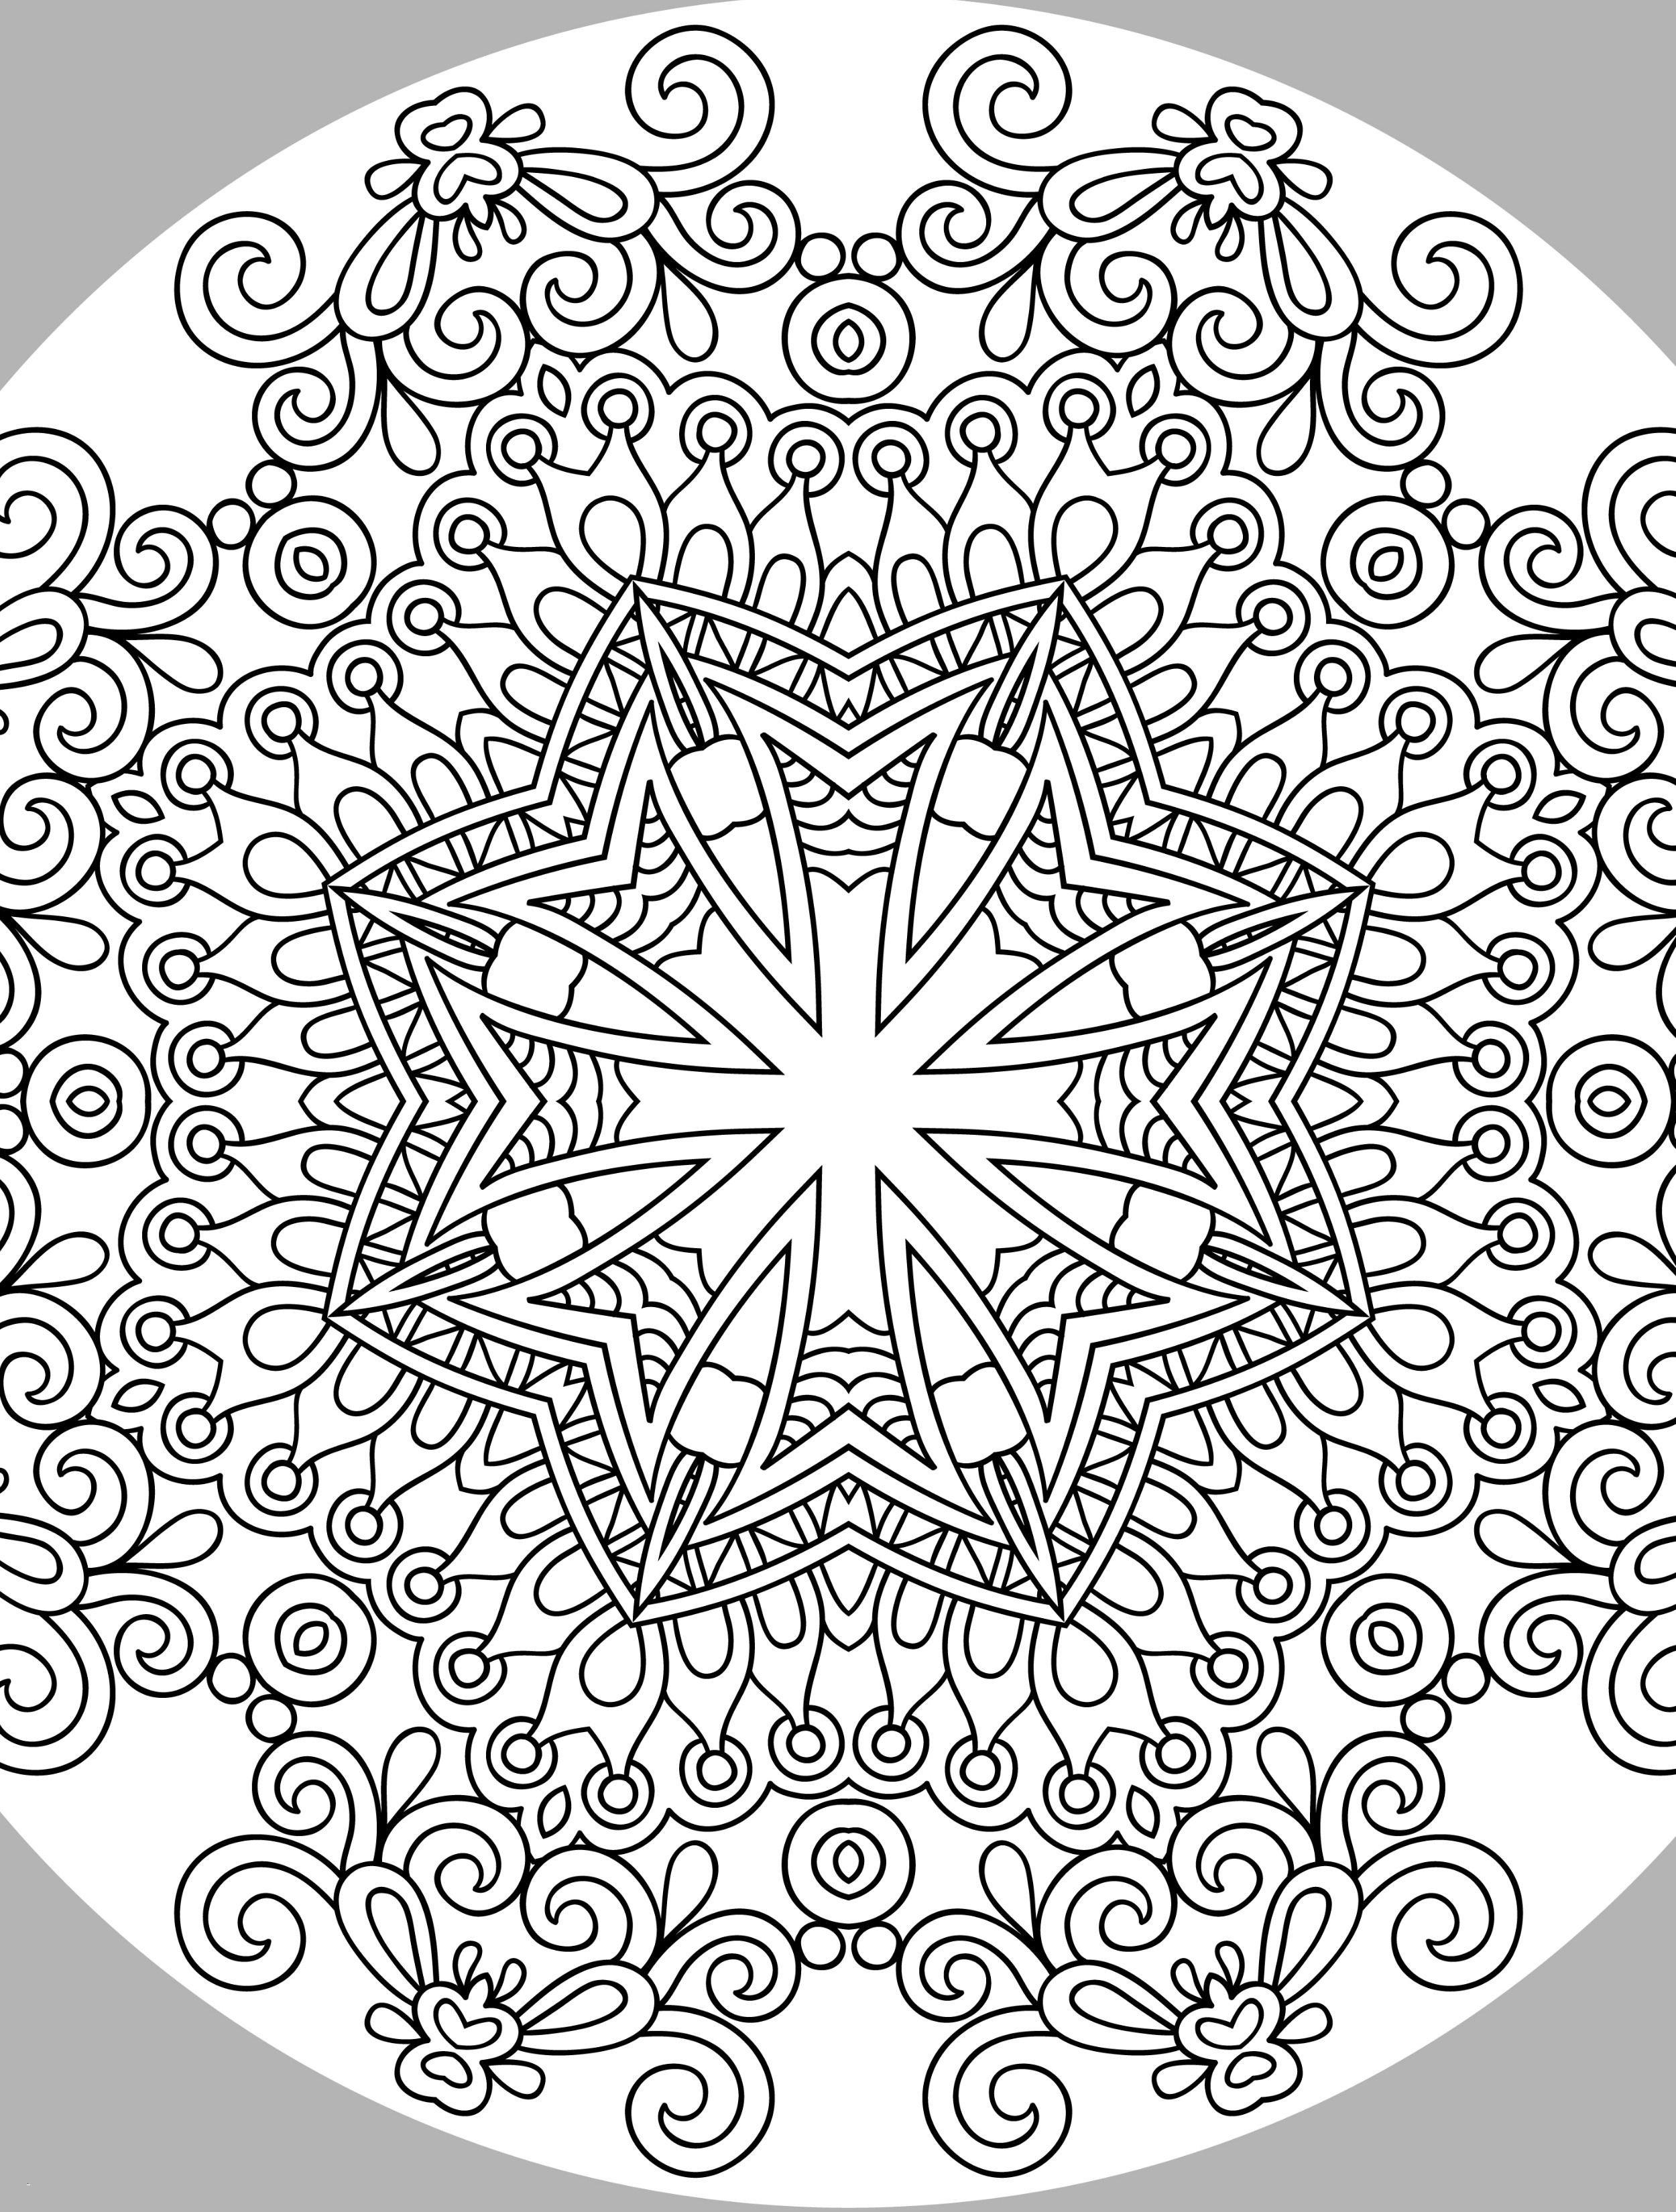 Mandala Coloring Pdf Lovely Mandala Coloring Books Free Unique 10 - Free Printable Mandalas Pdf